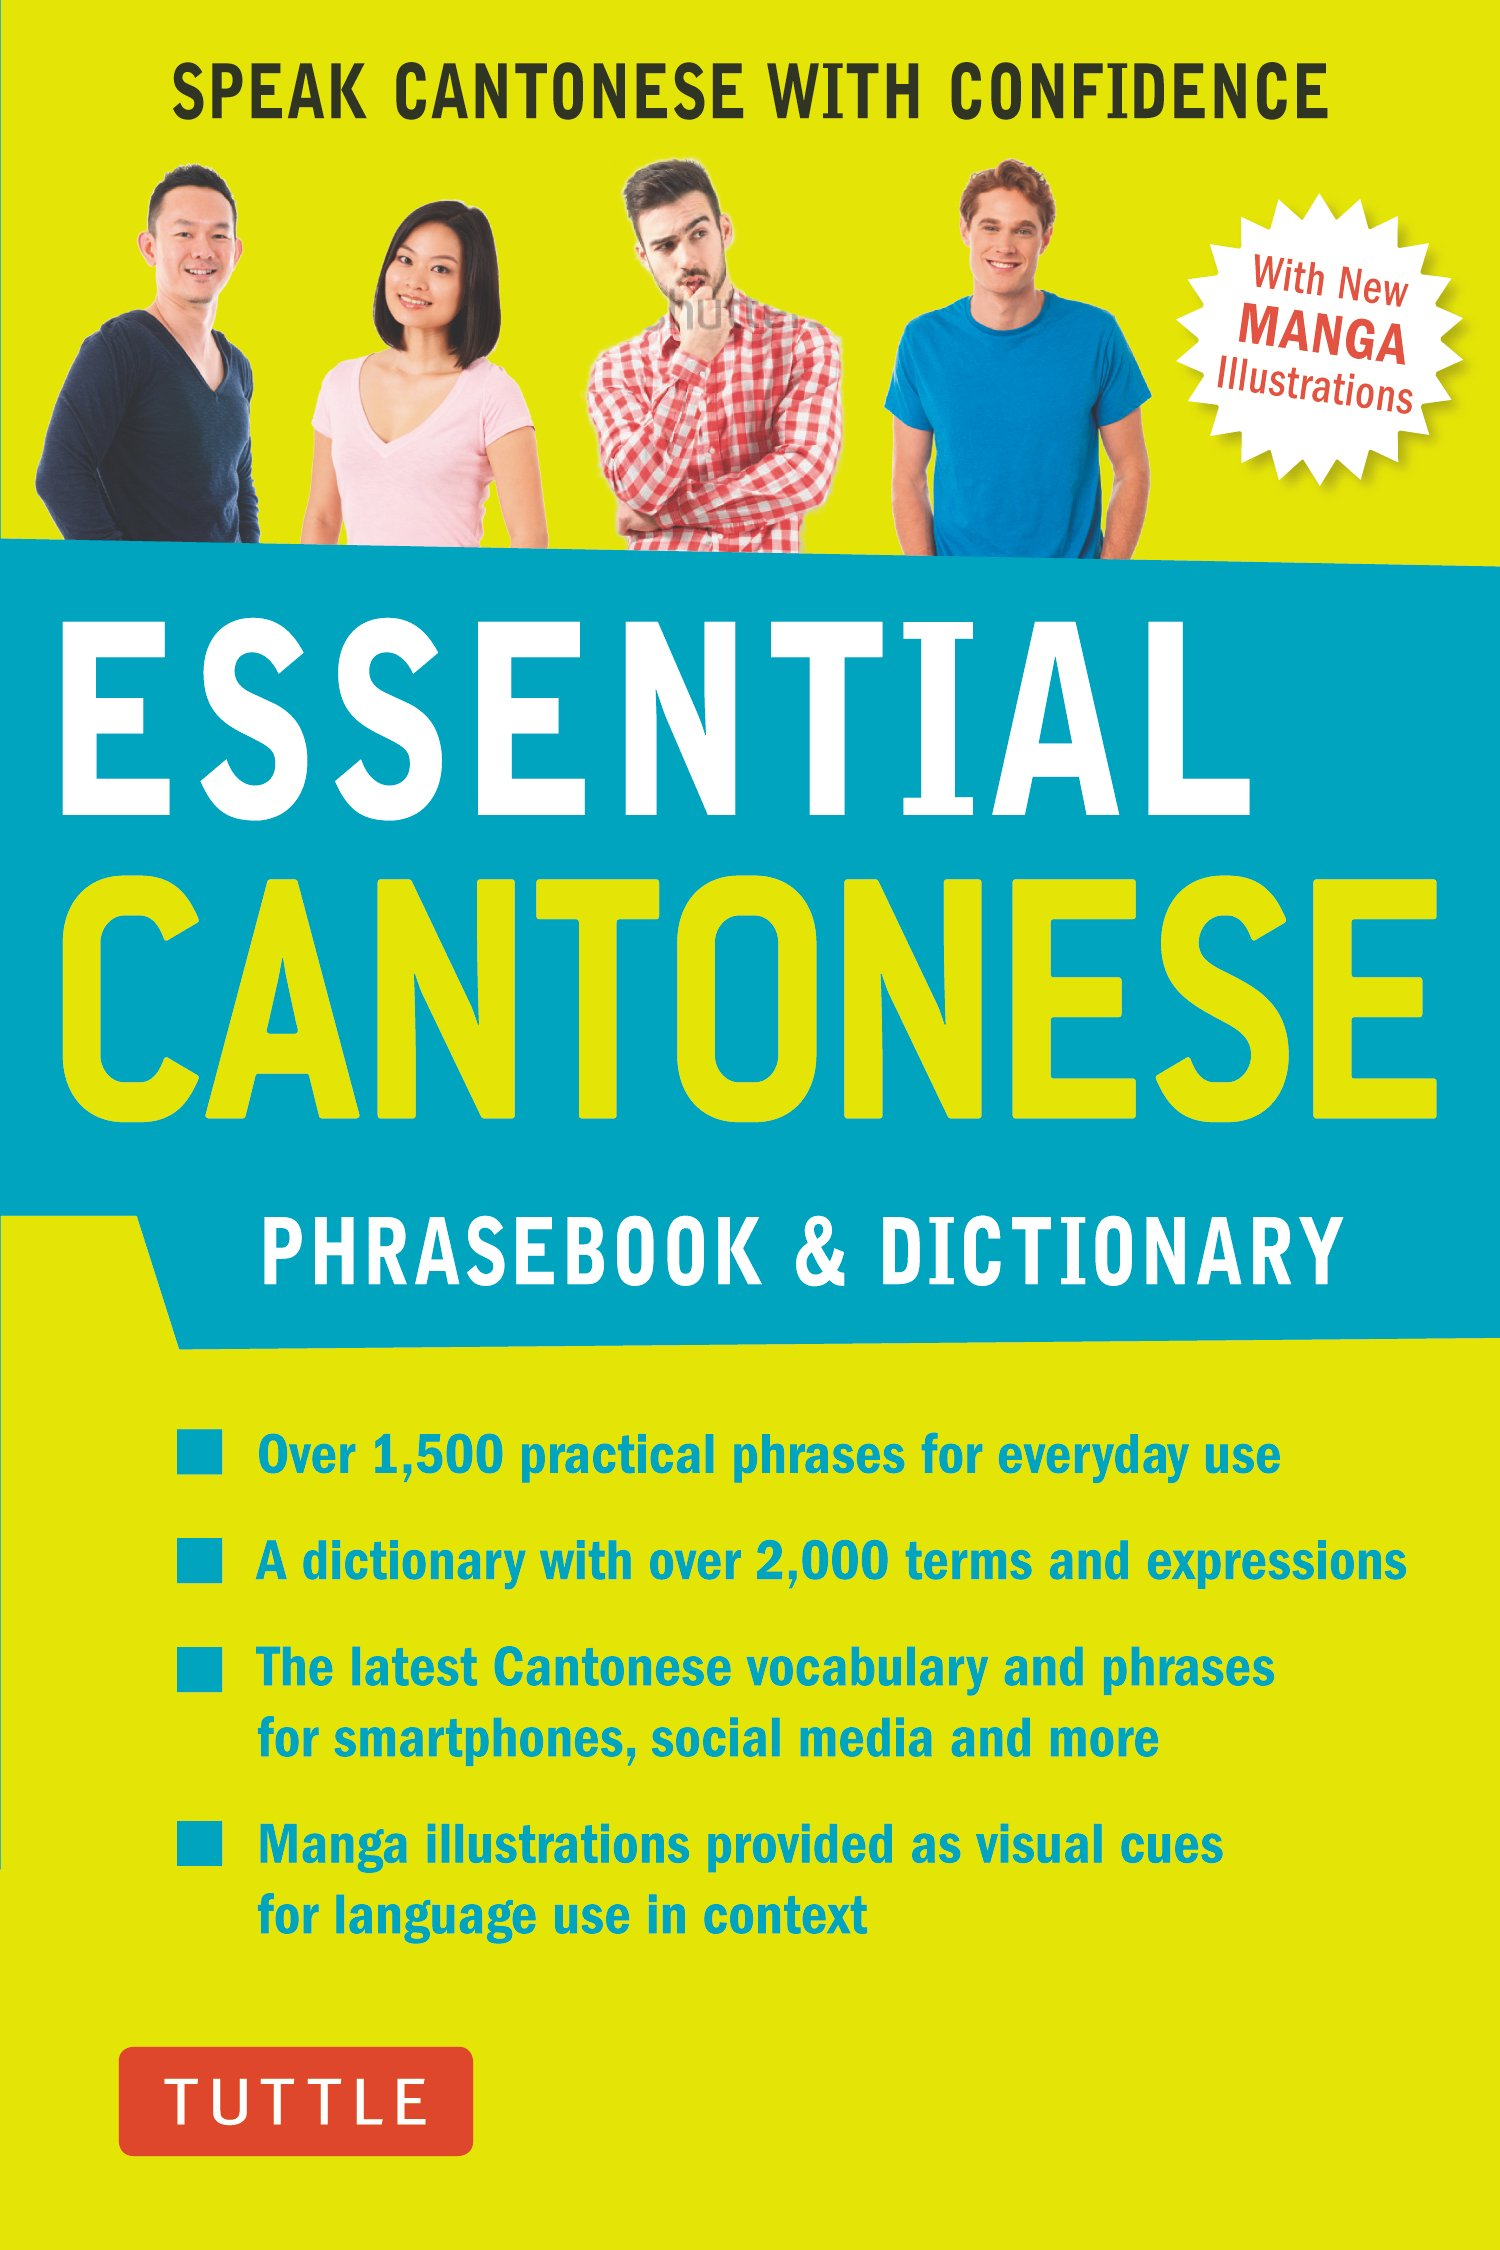 Amazon essential cantonese phrasebook dictionary speak amazon essential cantonese phrasebook dictionary speak cantonese with confidence cantonese chinese phrasebook dictionary with manga m4hsunfo